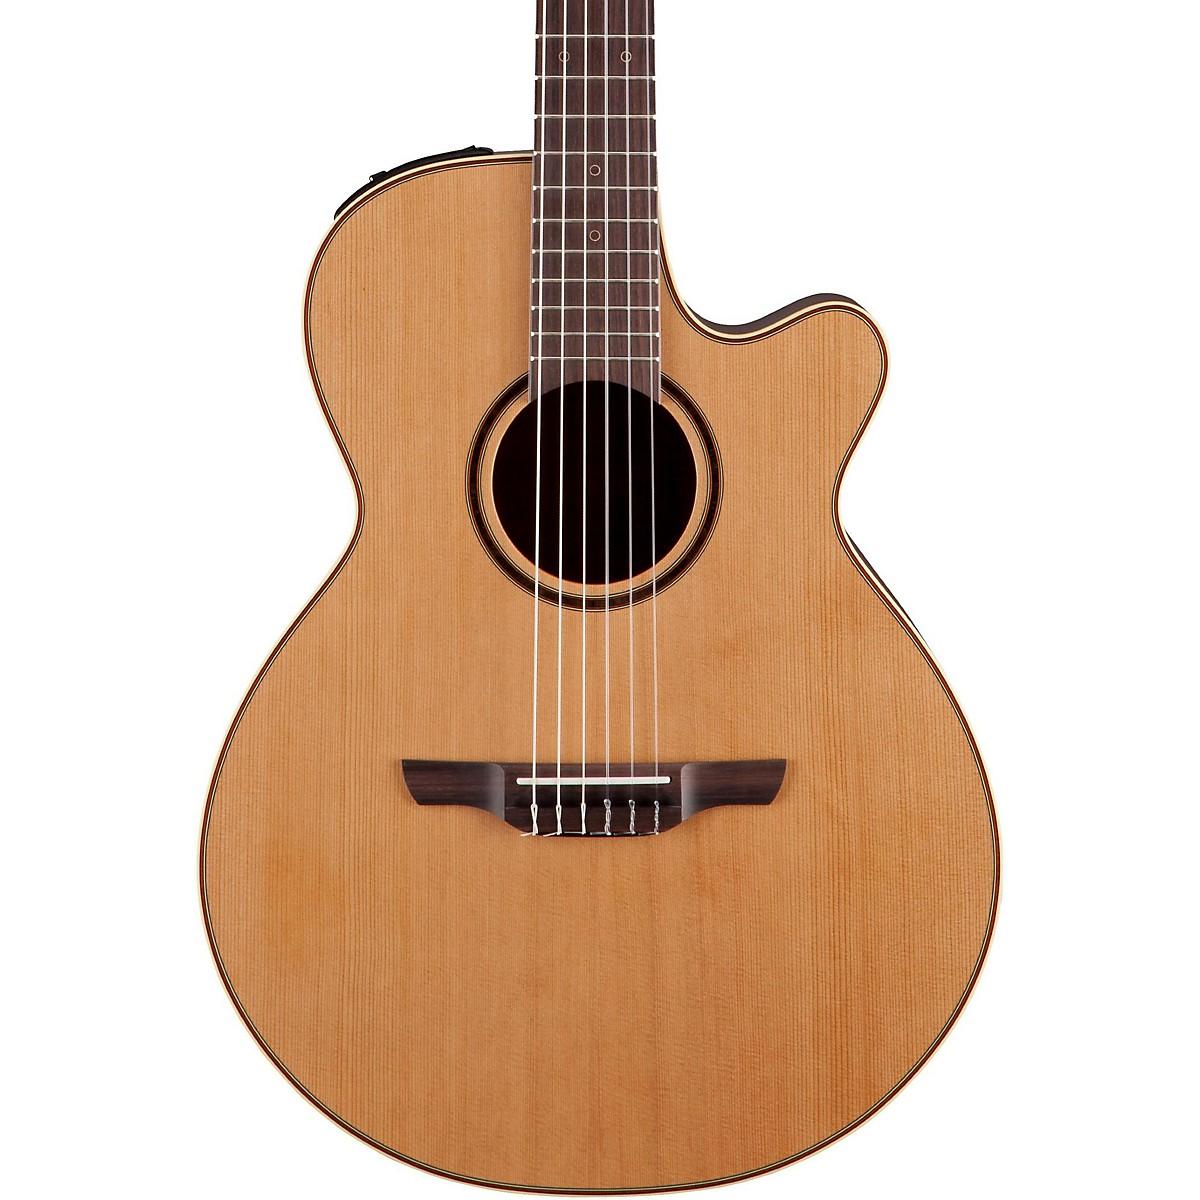 Takamine Pro Series 3 Folk Nylon Cutaway Acoustic-Electric Guitar